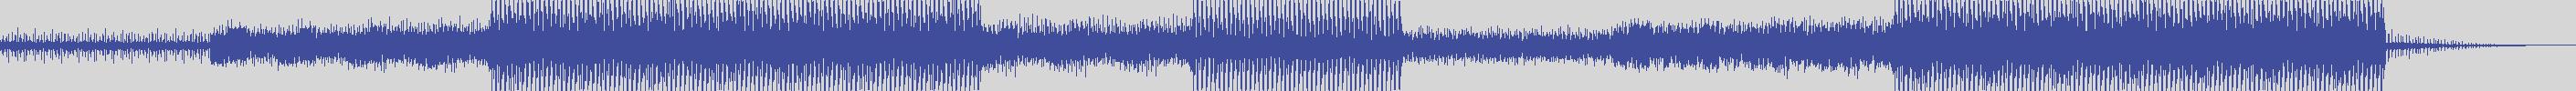 just_digital_records [JS1224] Nikon - Orion [Original Mix] audio wave form